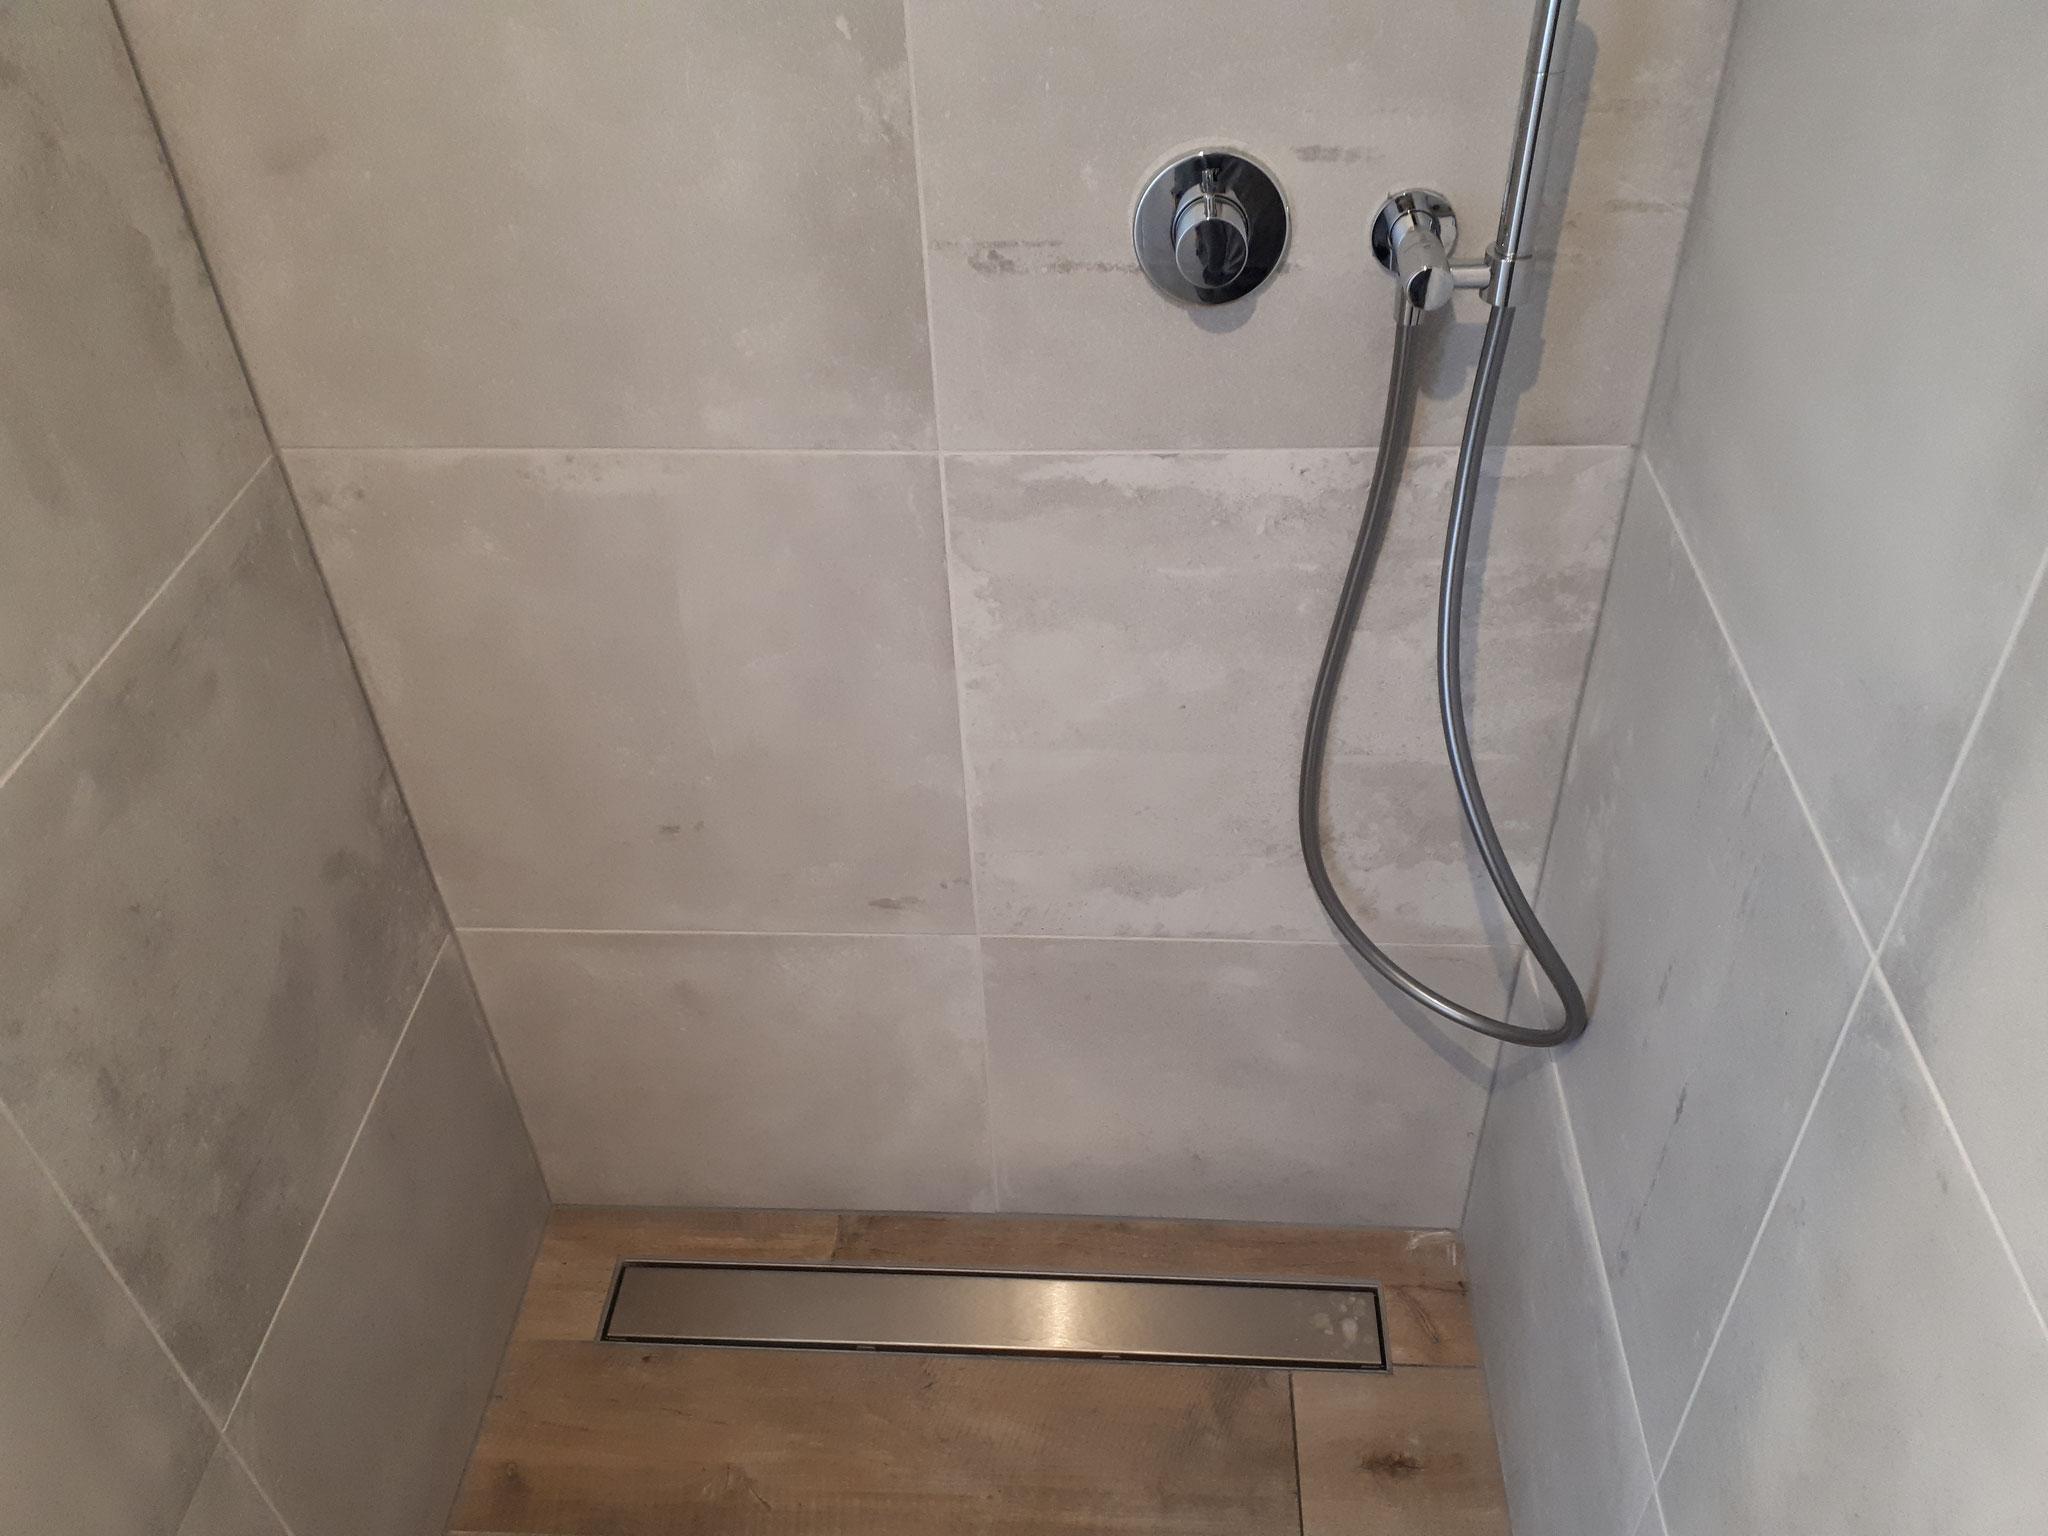 Elektrische Afzuiging Badkamer : Plaatsen dakkapel nieuwe badkamer te kwadendamme j.f. peeters & zn